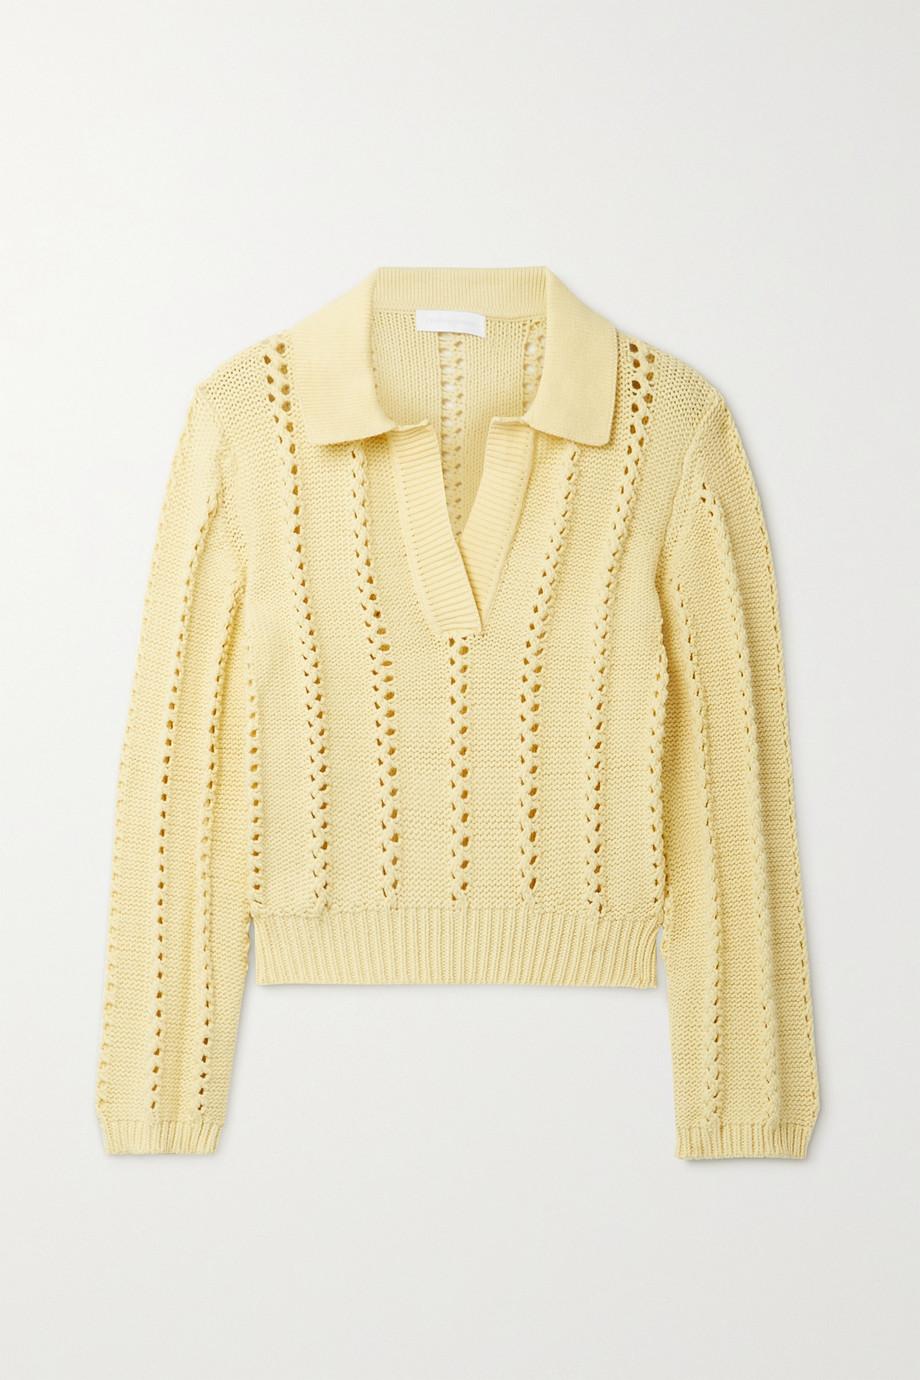 Jonathan Simkhai Berenice open-knit trimmed cotton-blend sweater